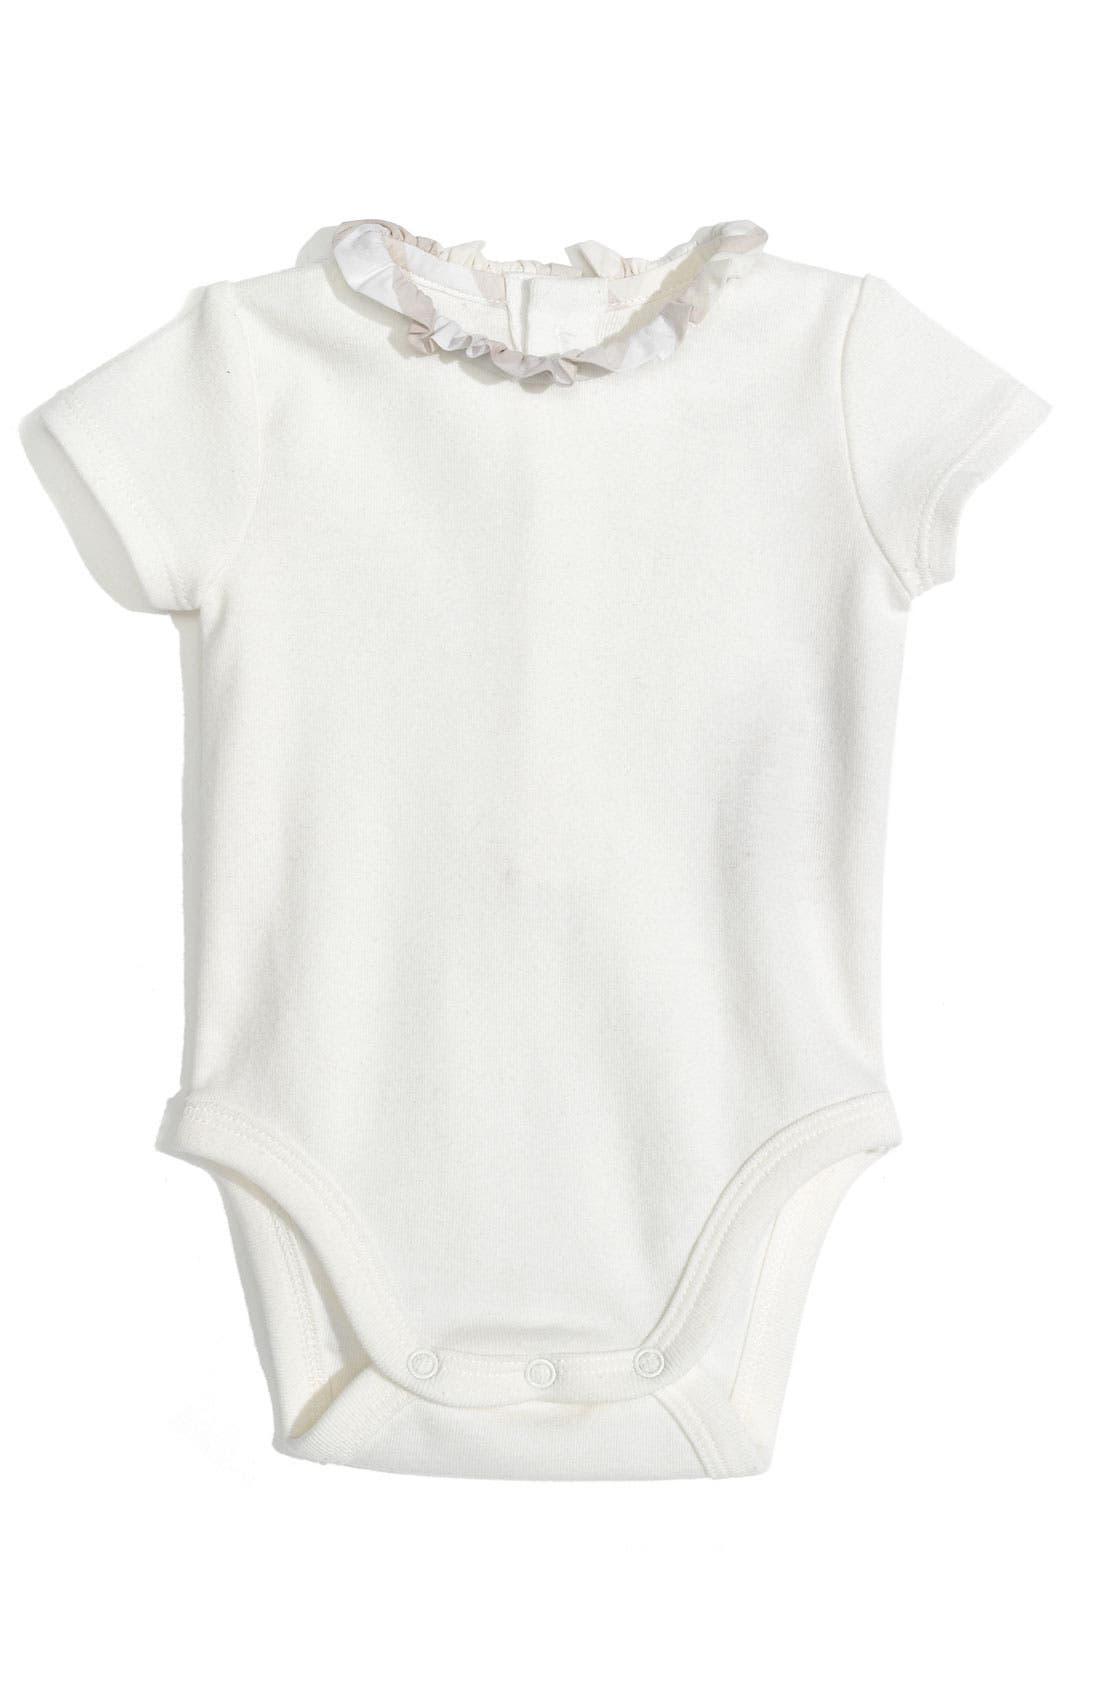 Alternate Image 1 Selected - Burberry 'Audrey' Ruffle Collar Bodysuit (Infant)